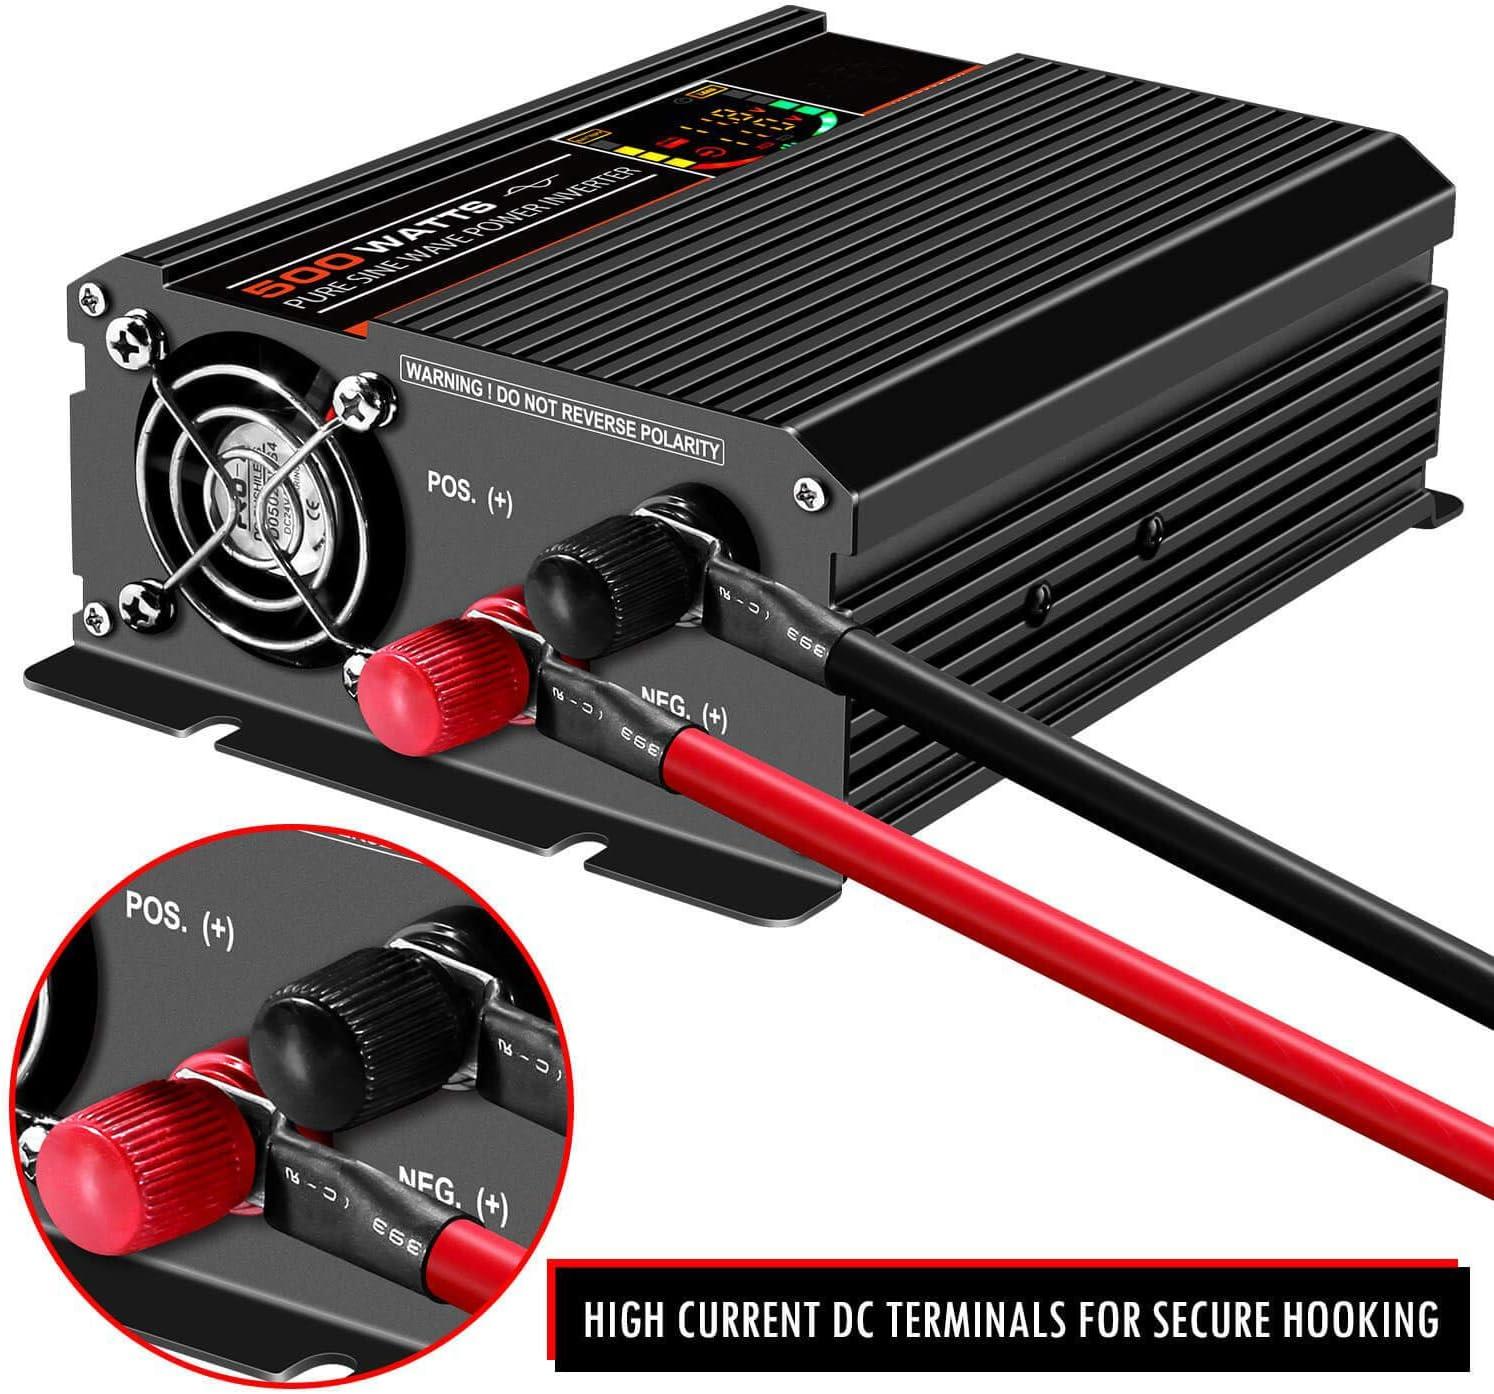 Patio, Lawn & Garden Power Inverters ghdonat.com 12V to 110V Back ...